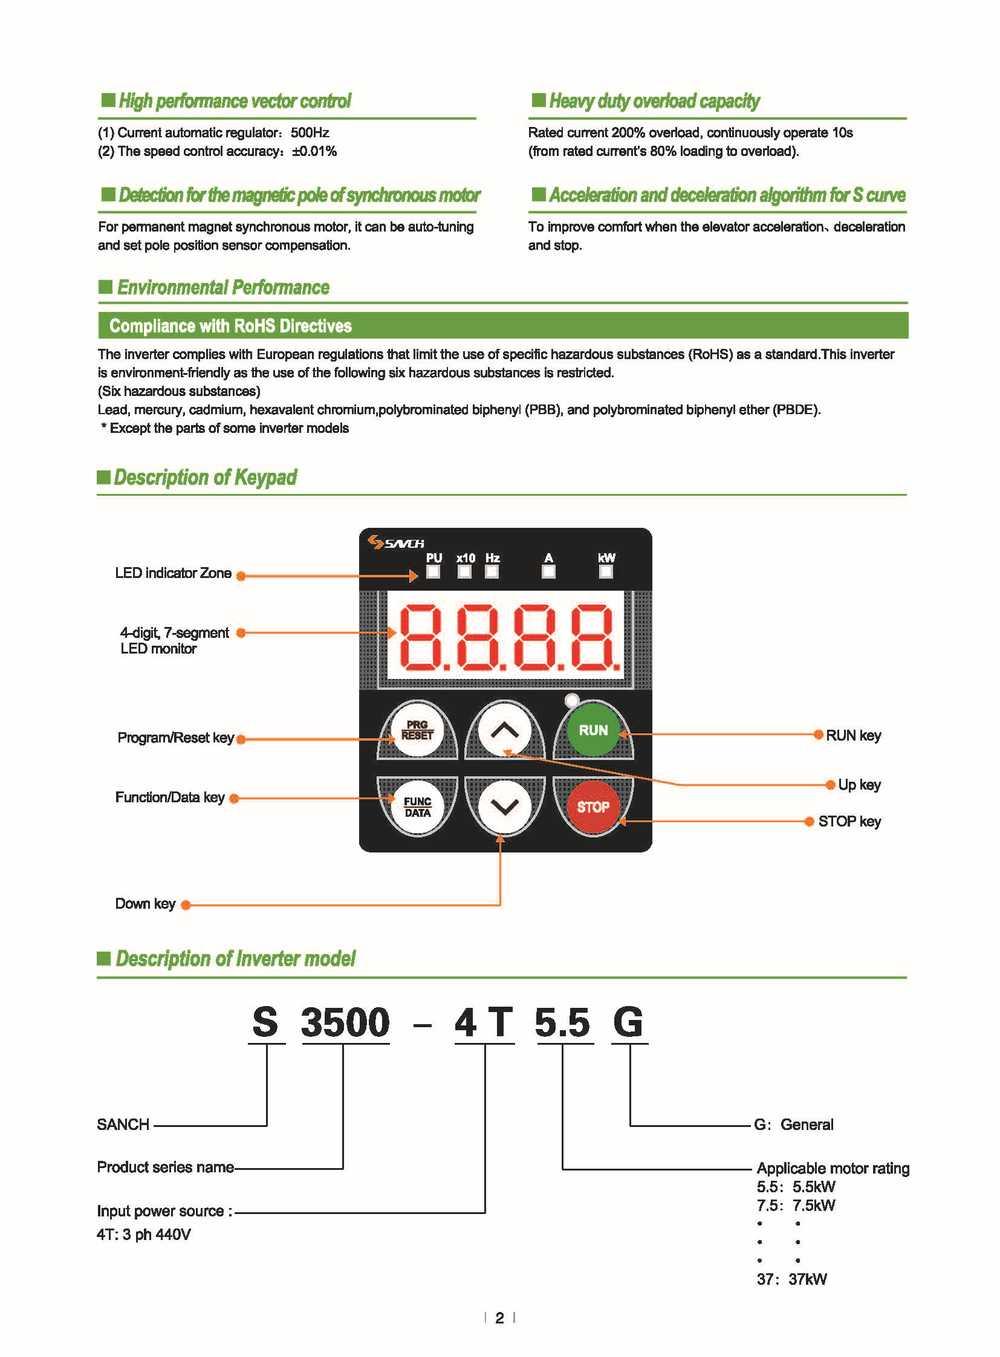 S3500 series Elevator inverter__05.jpg